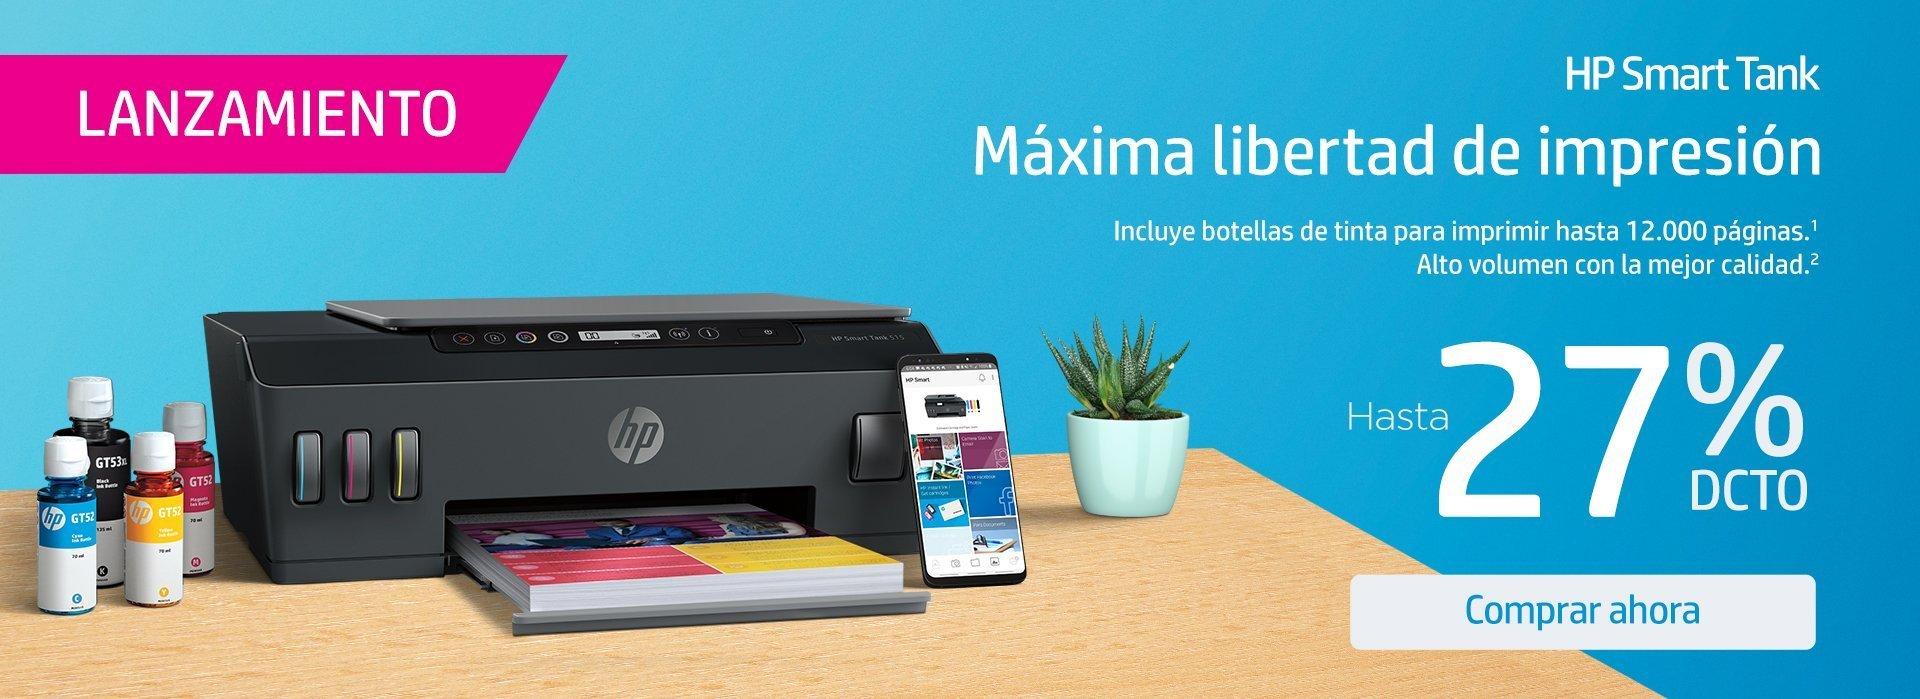 HP Smart Tank | Máxima libertad de impresión con hasta 27% dto